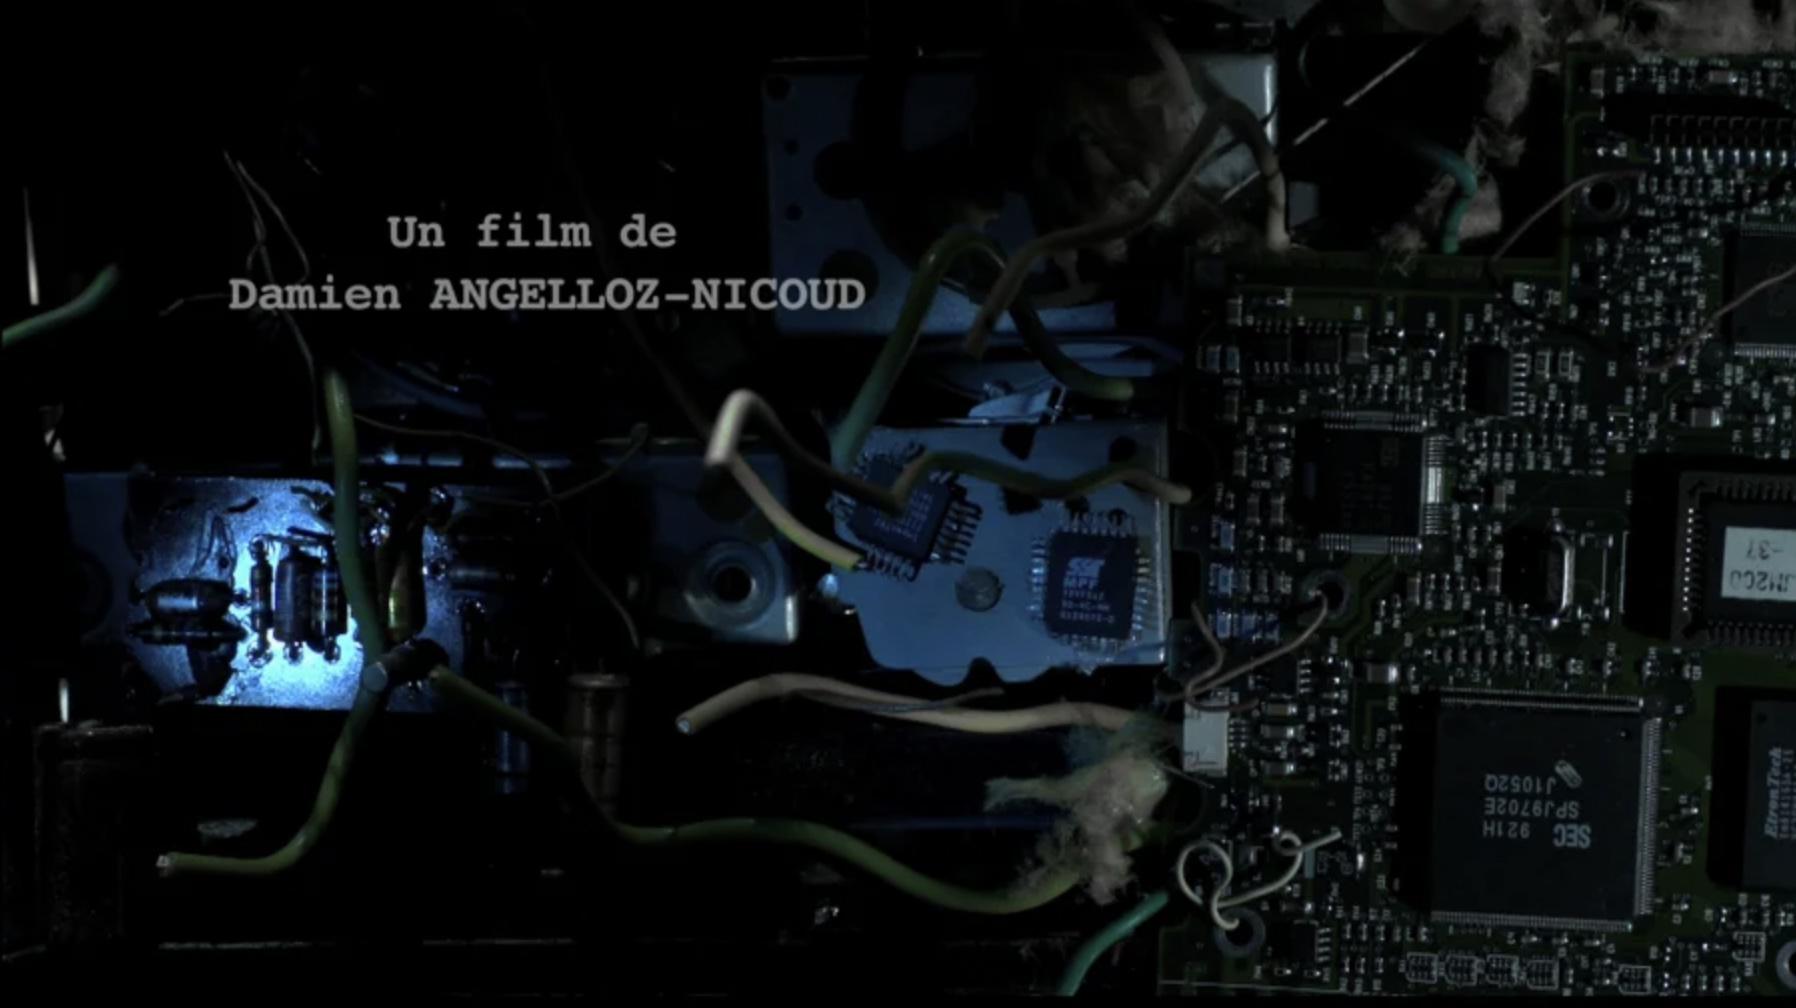 Dernière Demeure - Damien ANGELLOZ-NICOUD - 2013